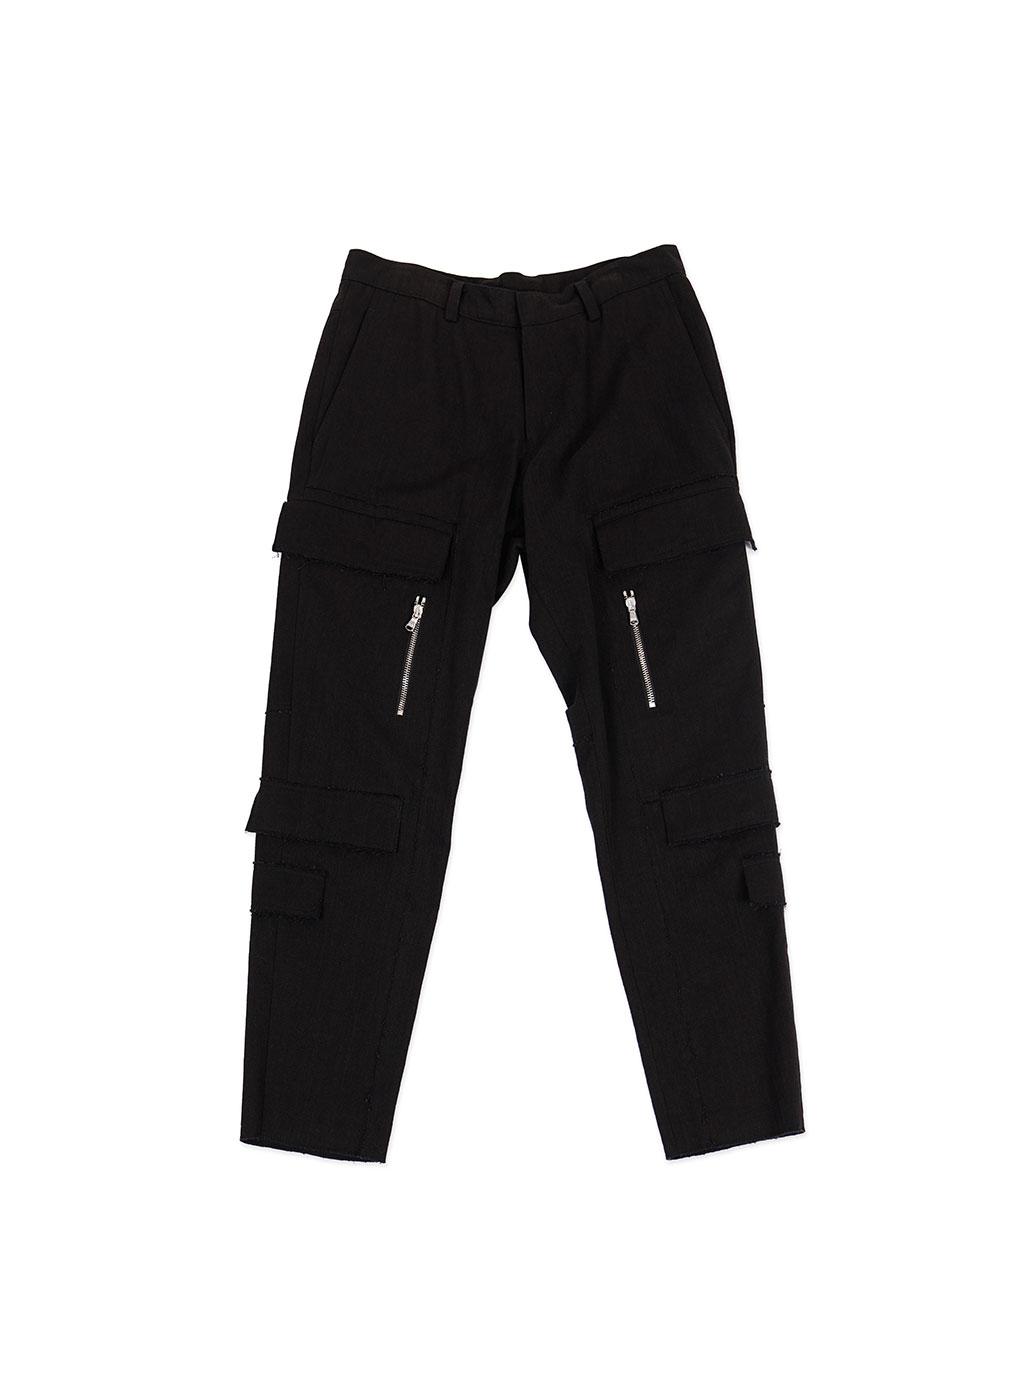 Black New Cargo Denim Trousers